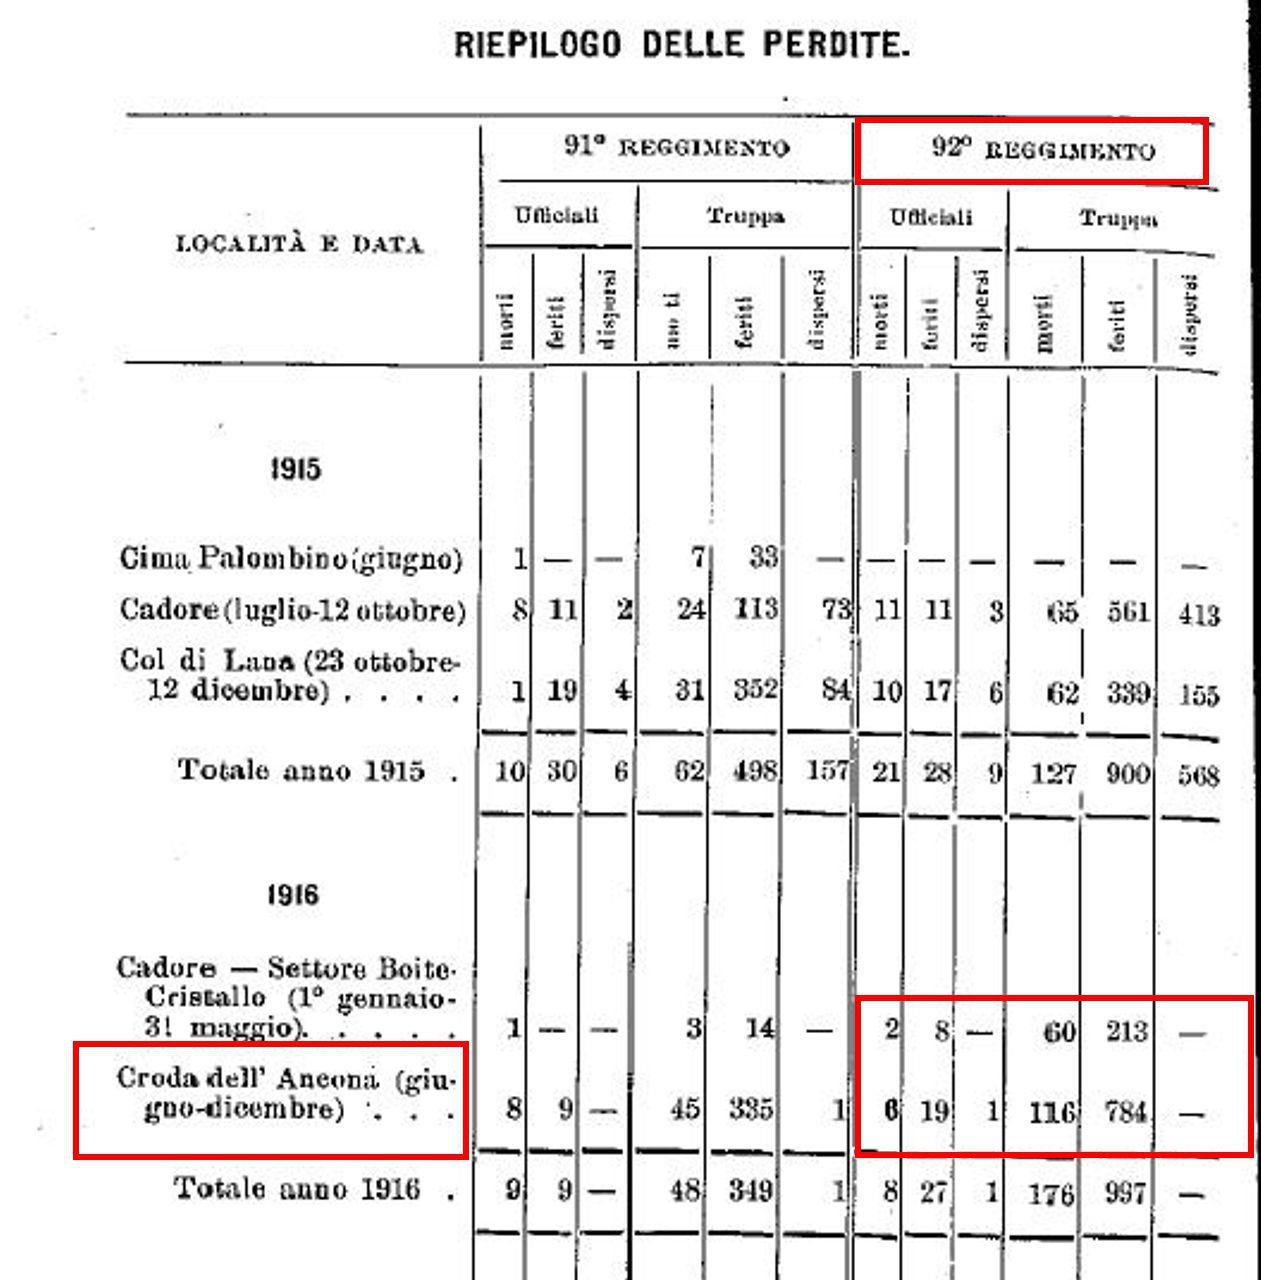 riepilogo-delle-perdite-brigata-basilicata-anno-1916